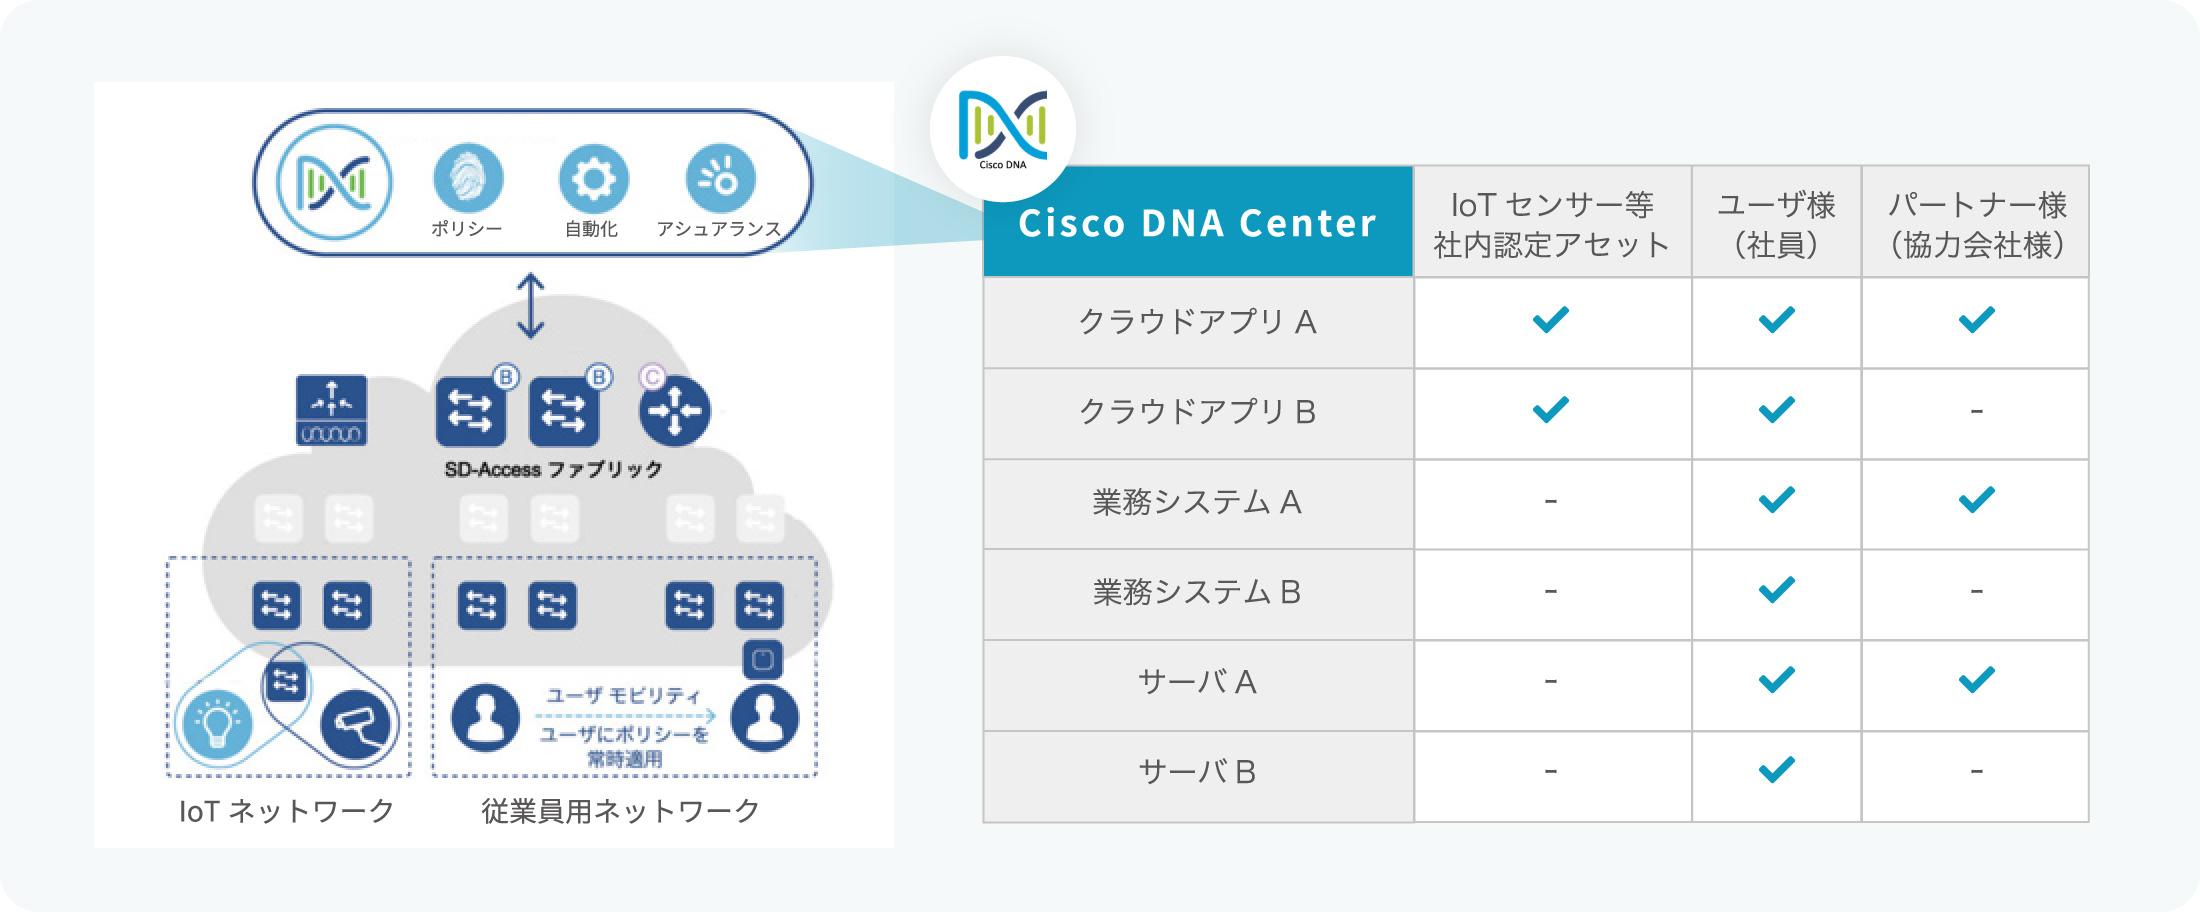 Cisco DNA Centerの概要図・表